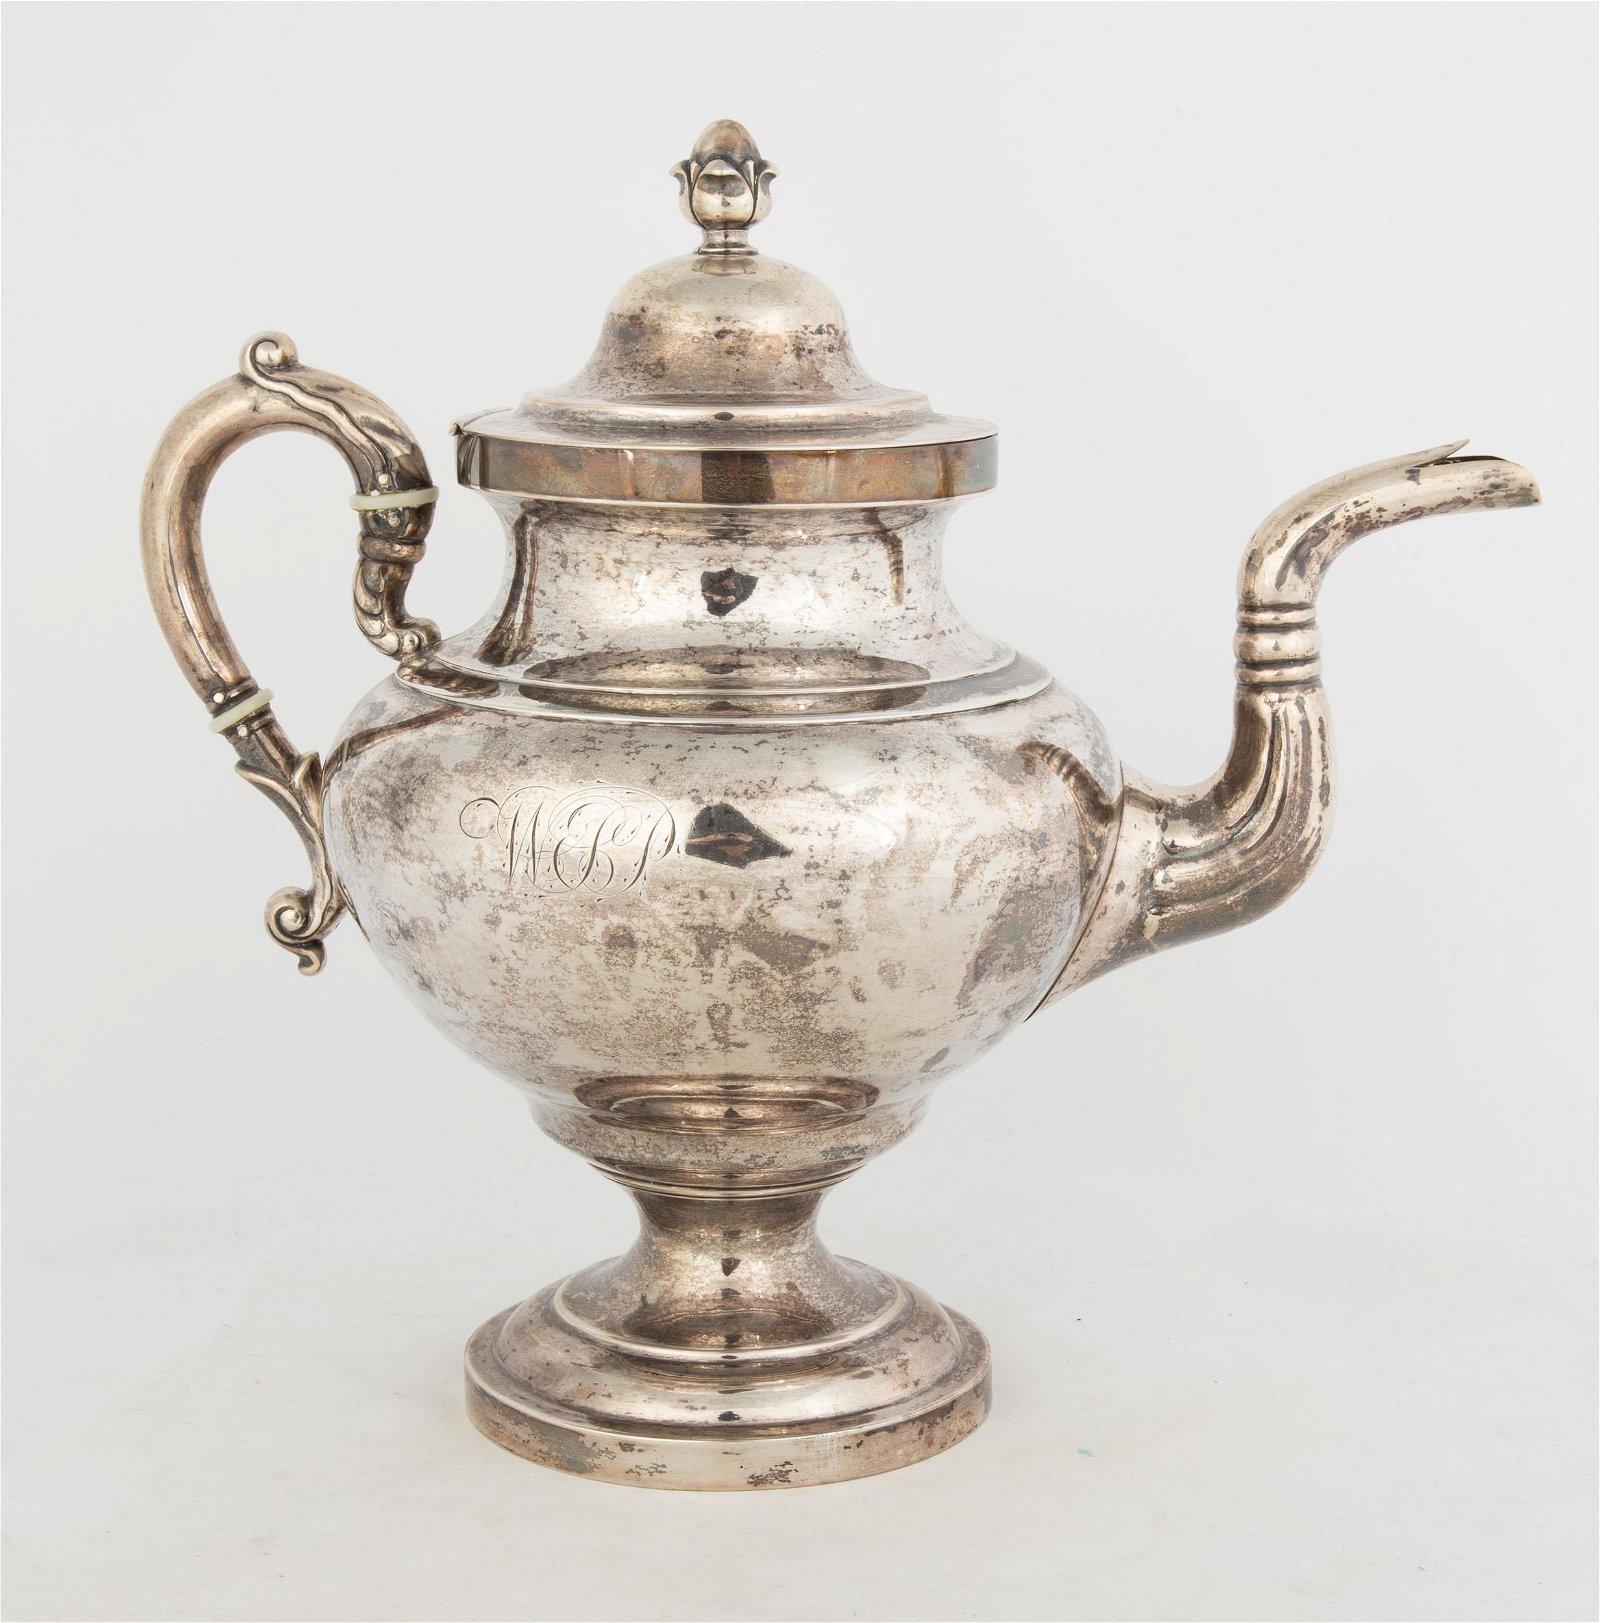 N.J. Bogert, New York, Coin Silver Coffee Pot